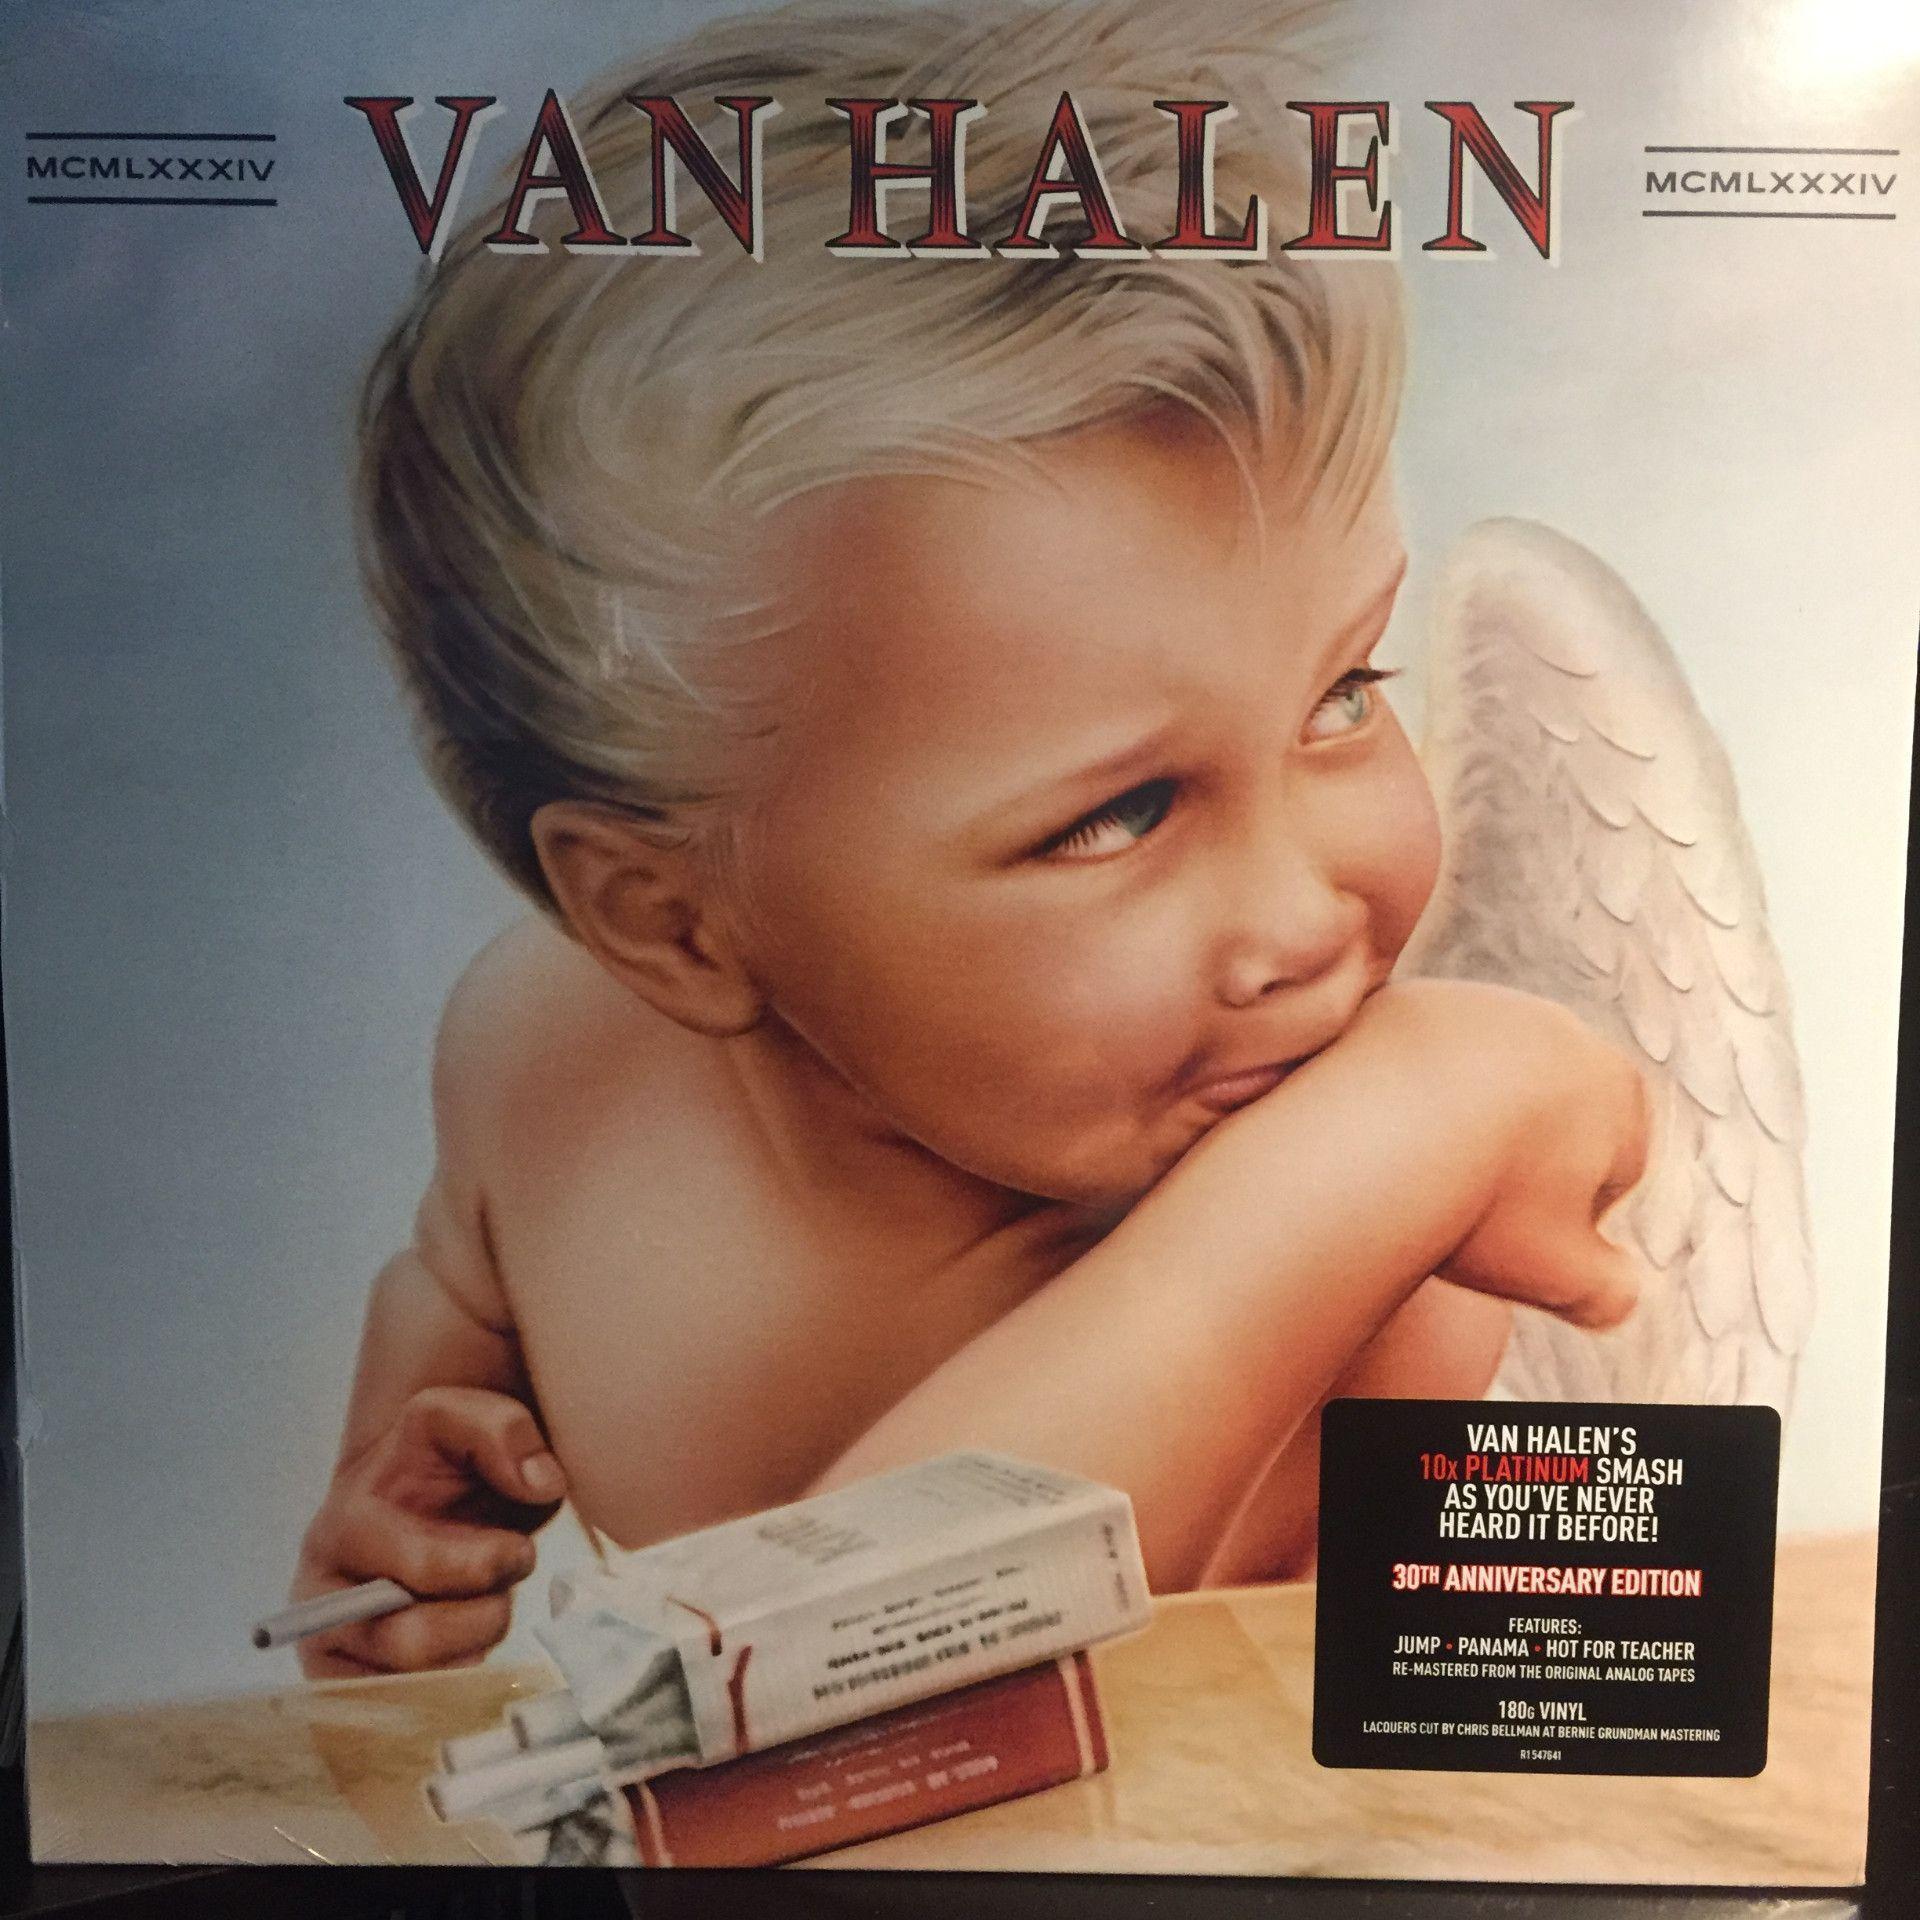 31b4b3bee19 VAN HALEN--1984--NEW!! 30th Anniversary Edition--Remastered ...